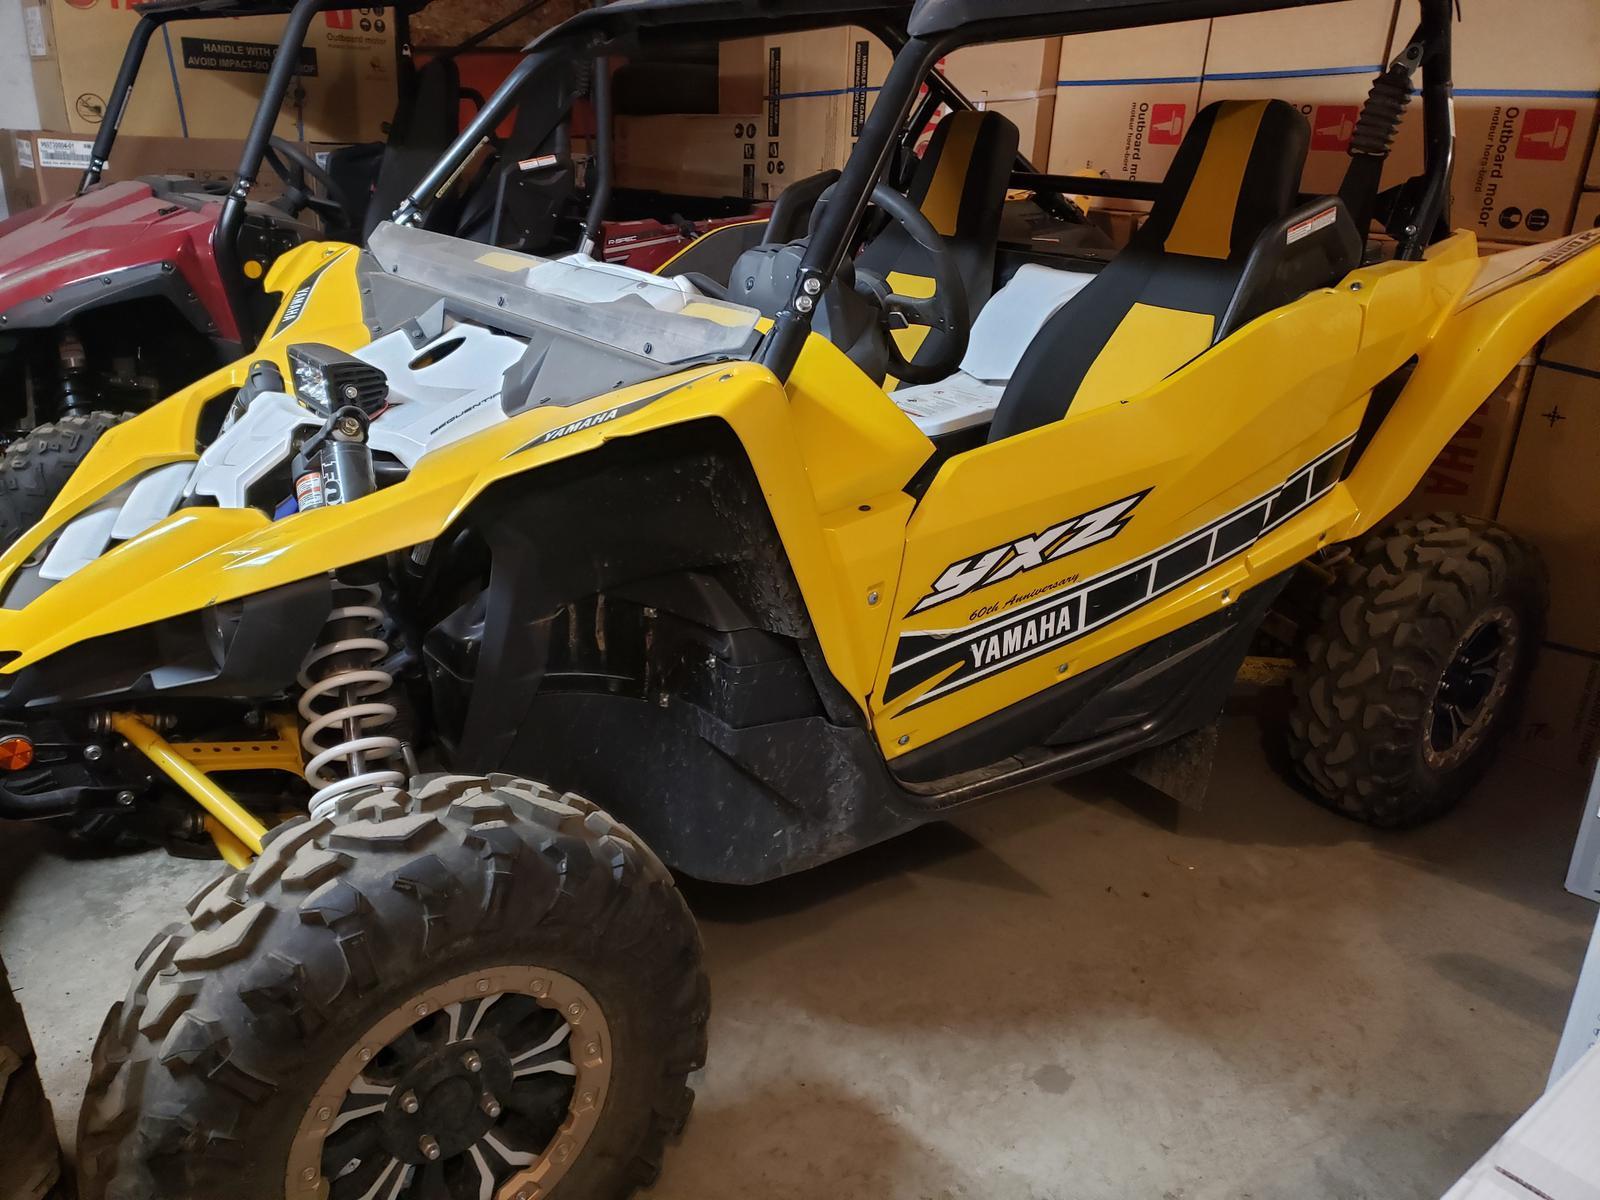 Inventory Nicola Motorsports Merritt, BC (250) 378-2416